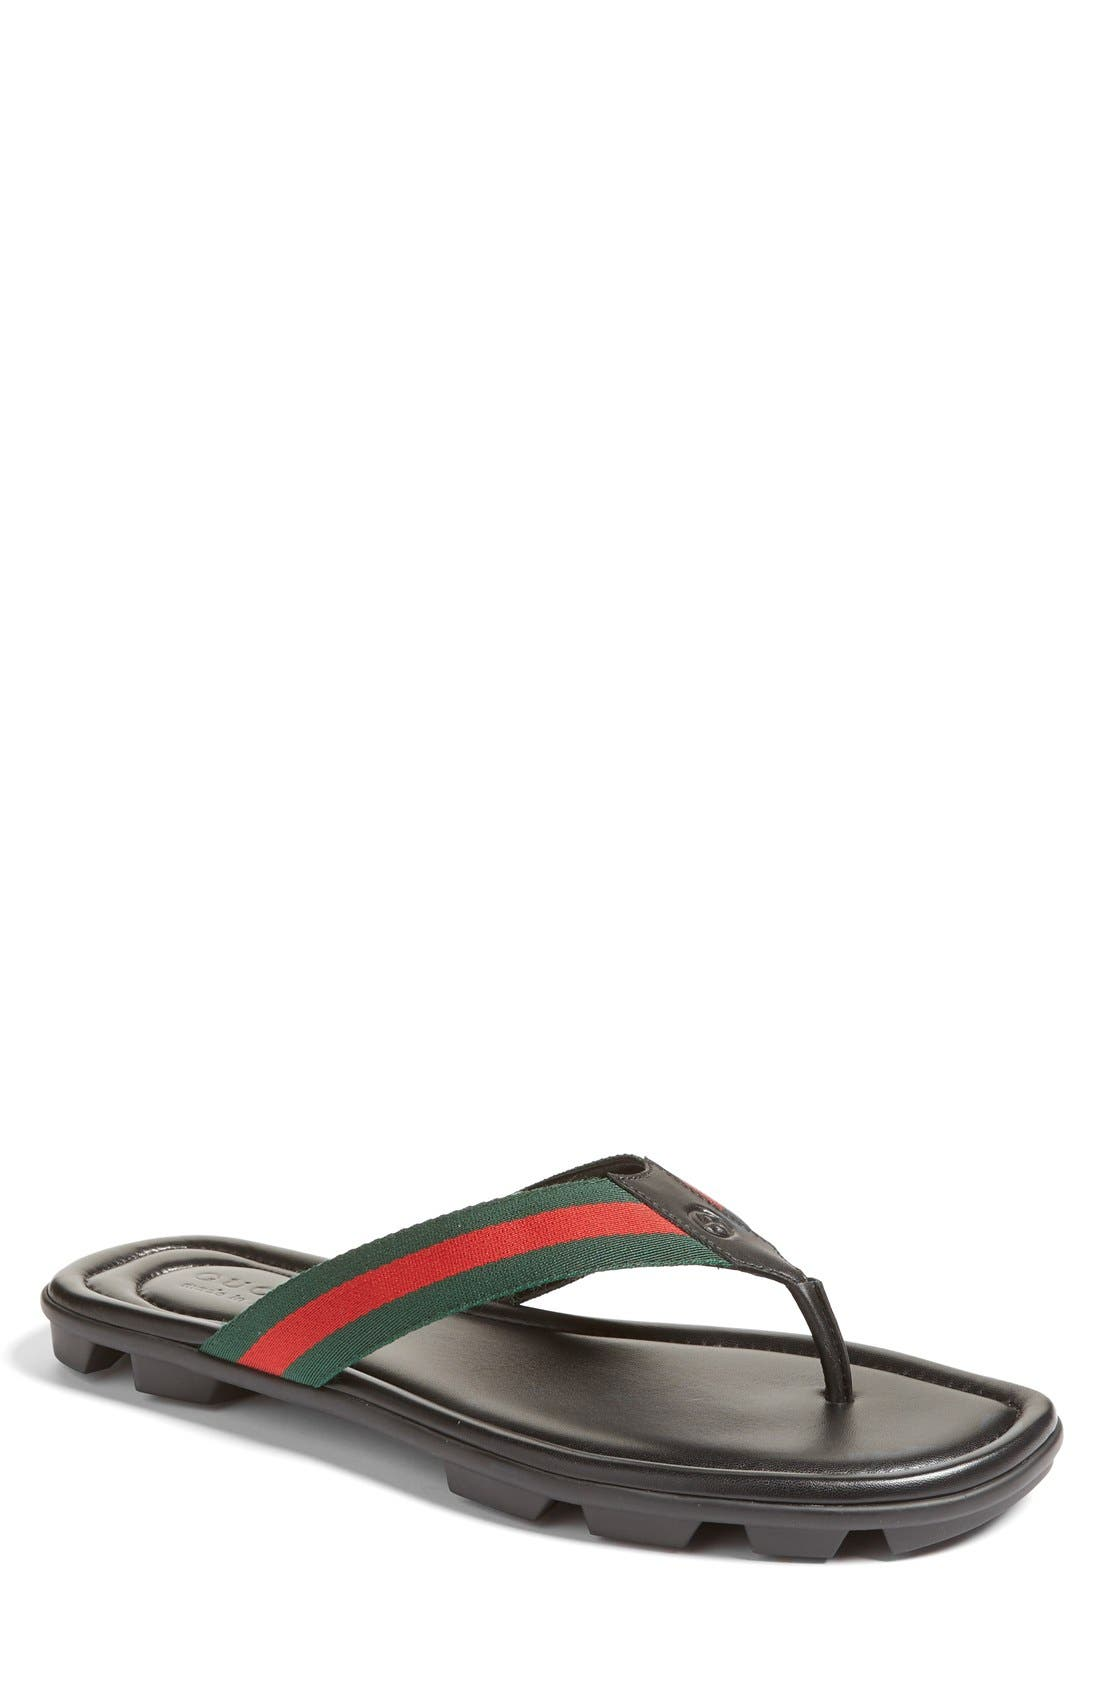 Mens Sandals Topman Mens Blue White and Navy Flip Flops Sandals Clearance Sale